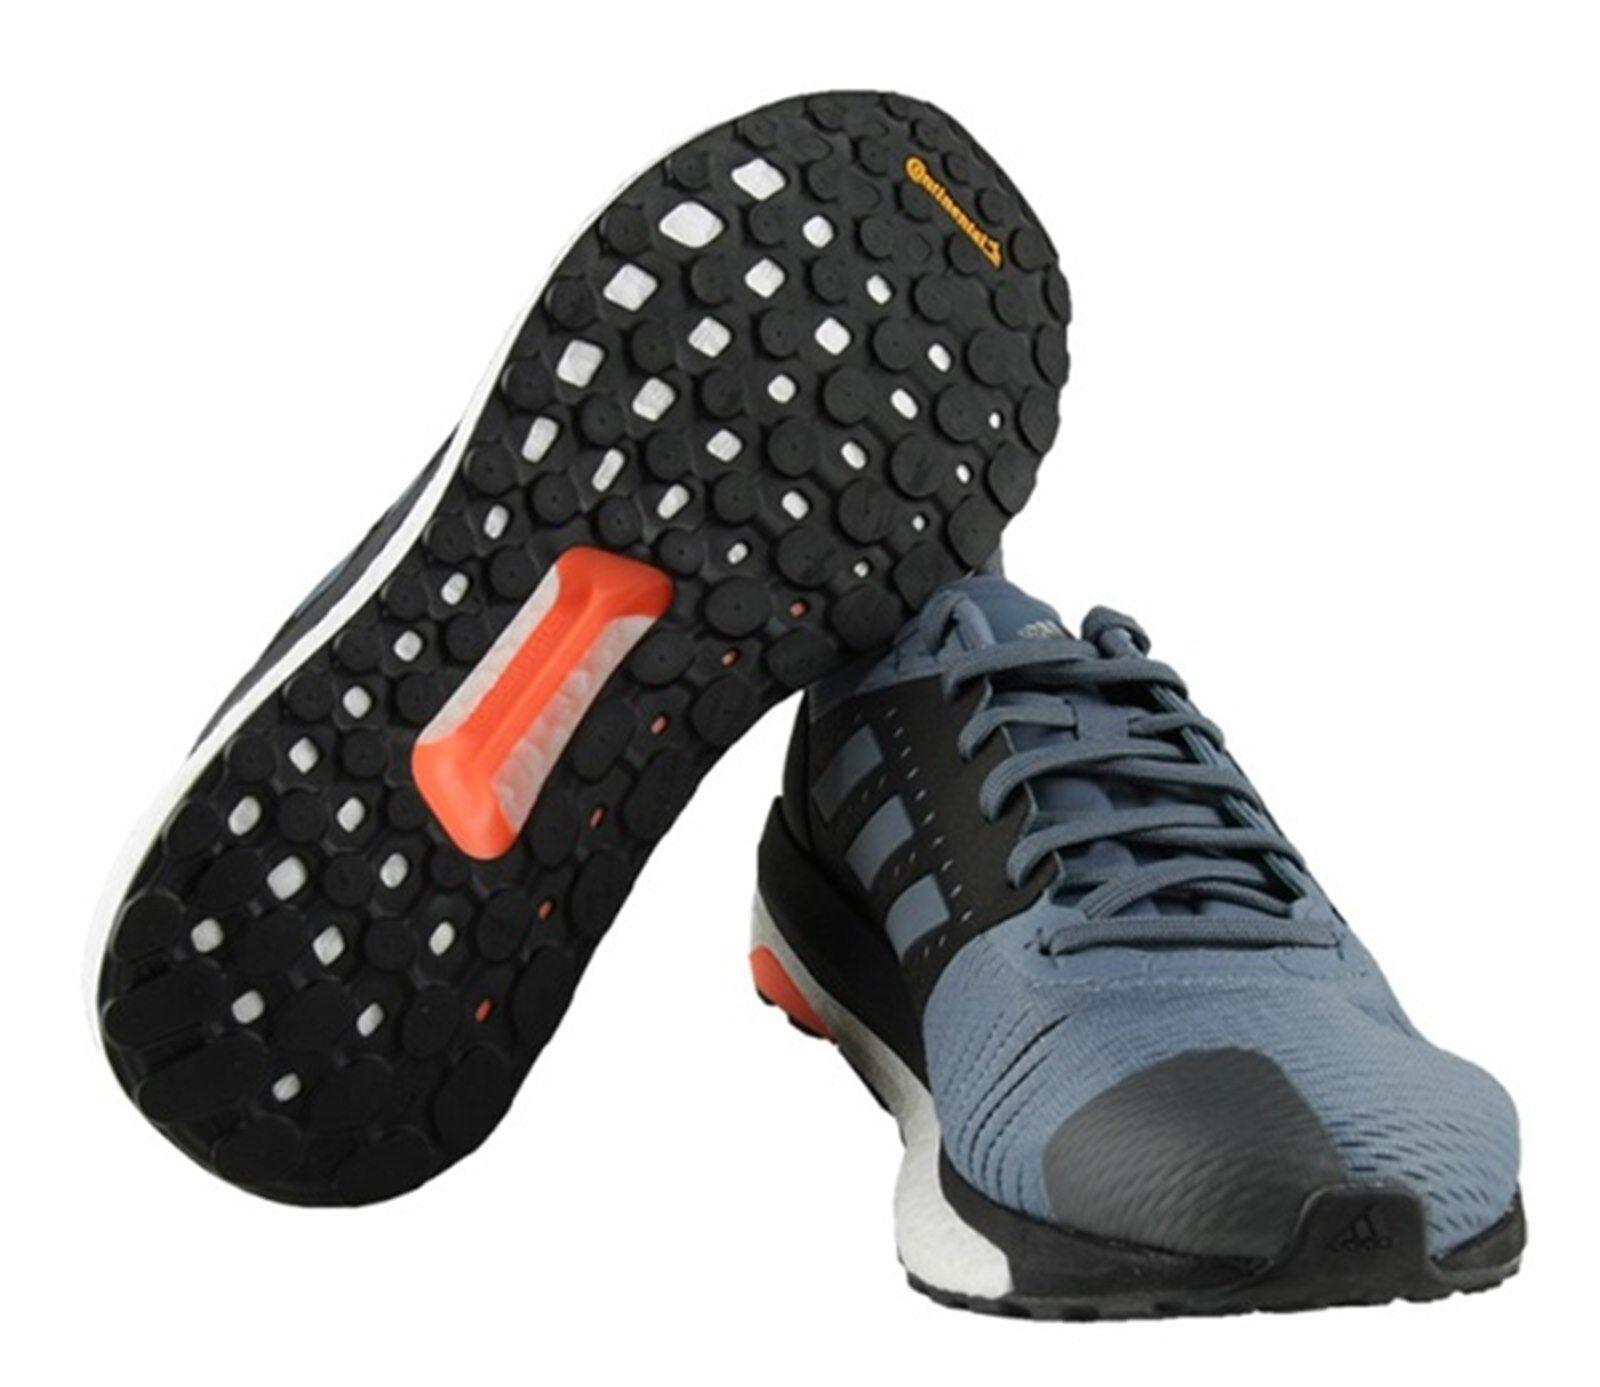 Adidas Zapatos De Entrenamiento Para Hombre Solar Glide St Correr gris Negro Zapatillas Zapato CM8048